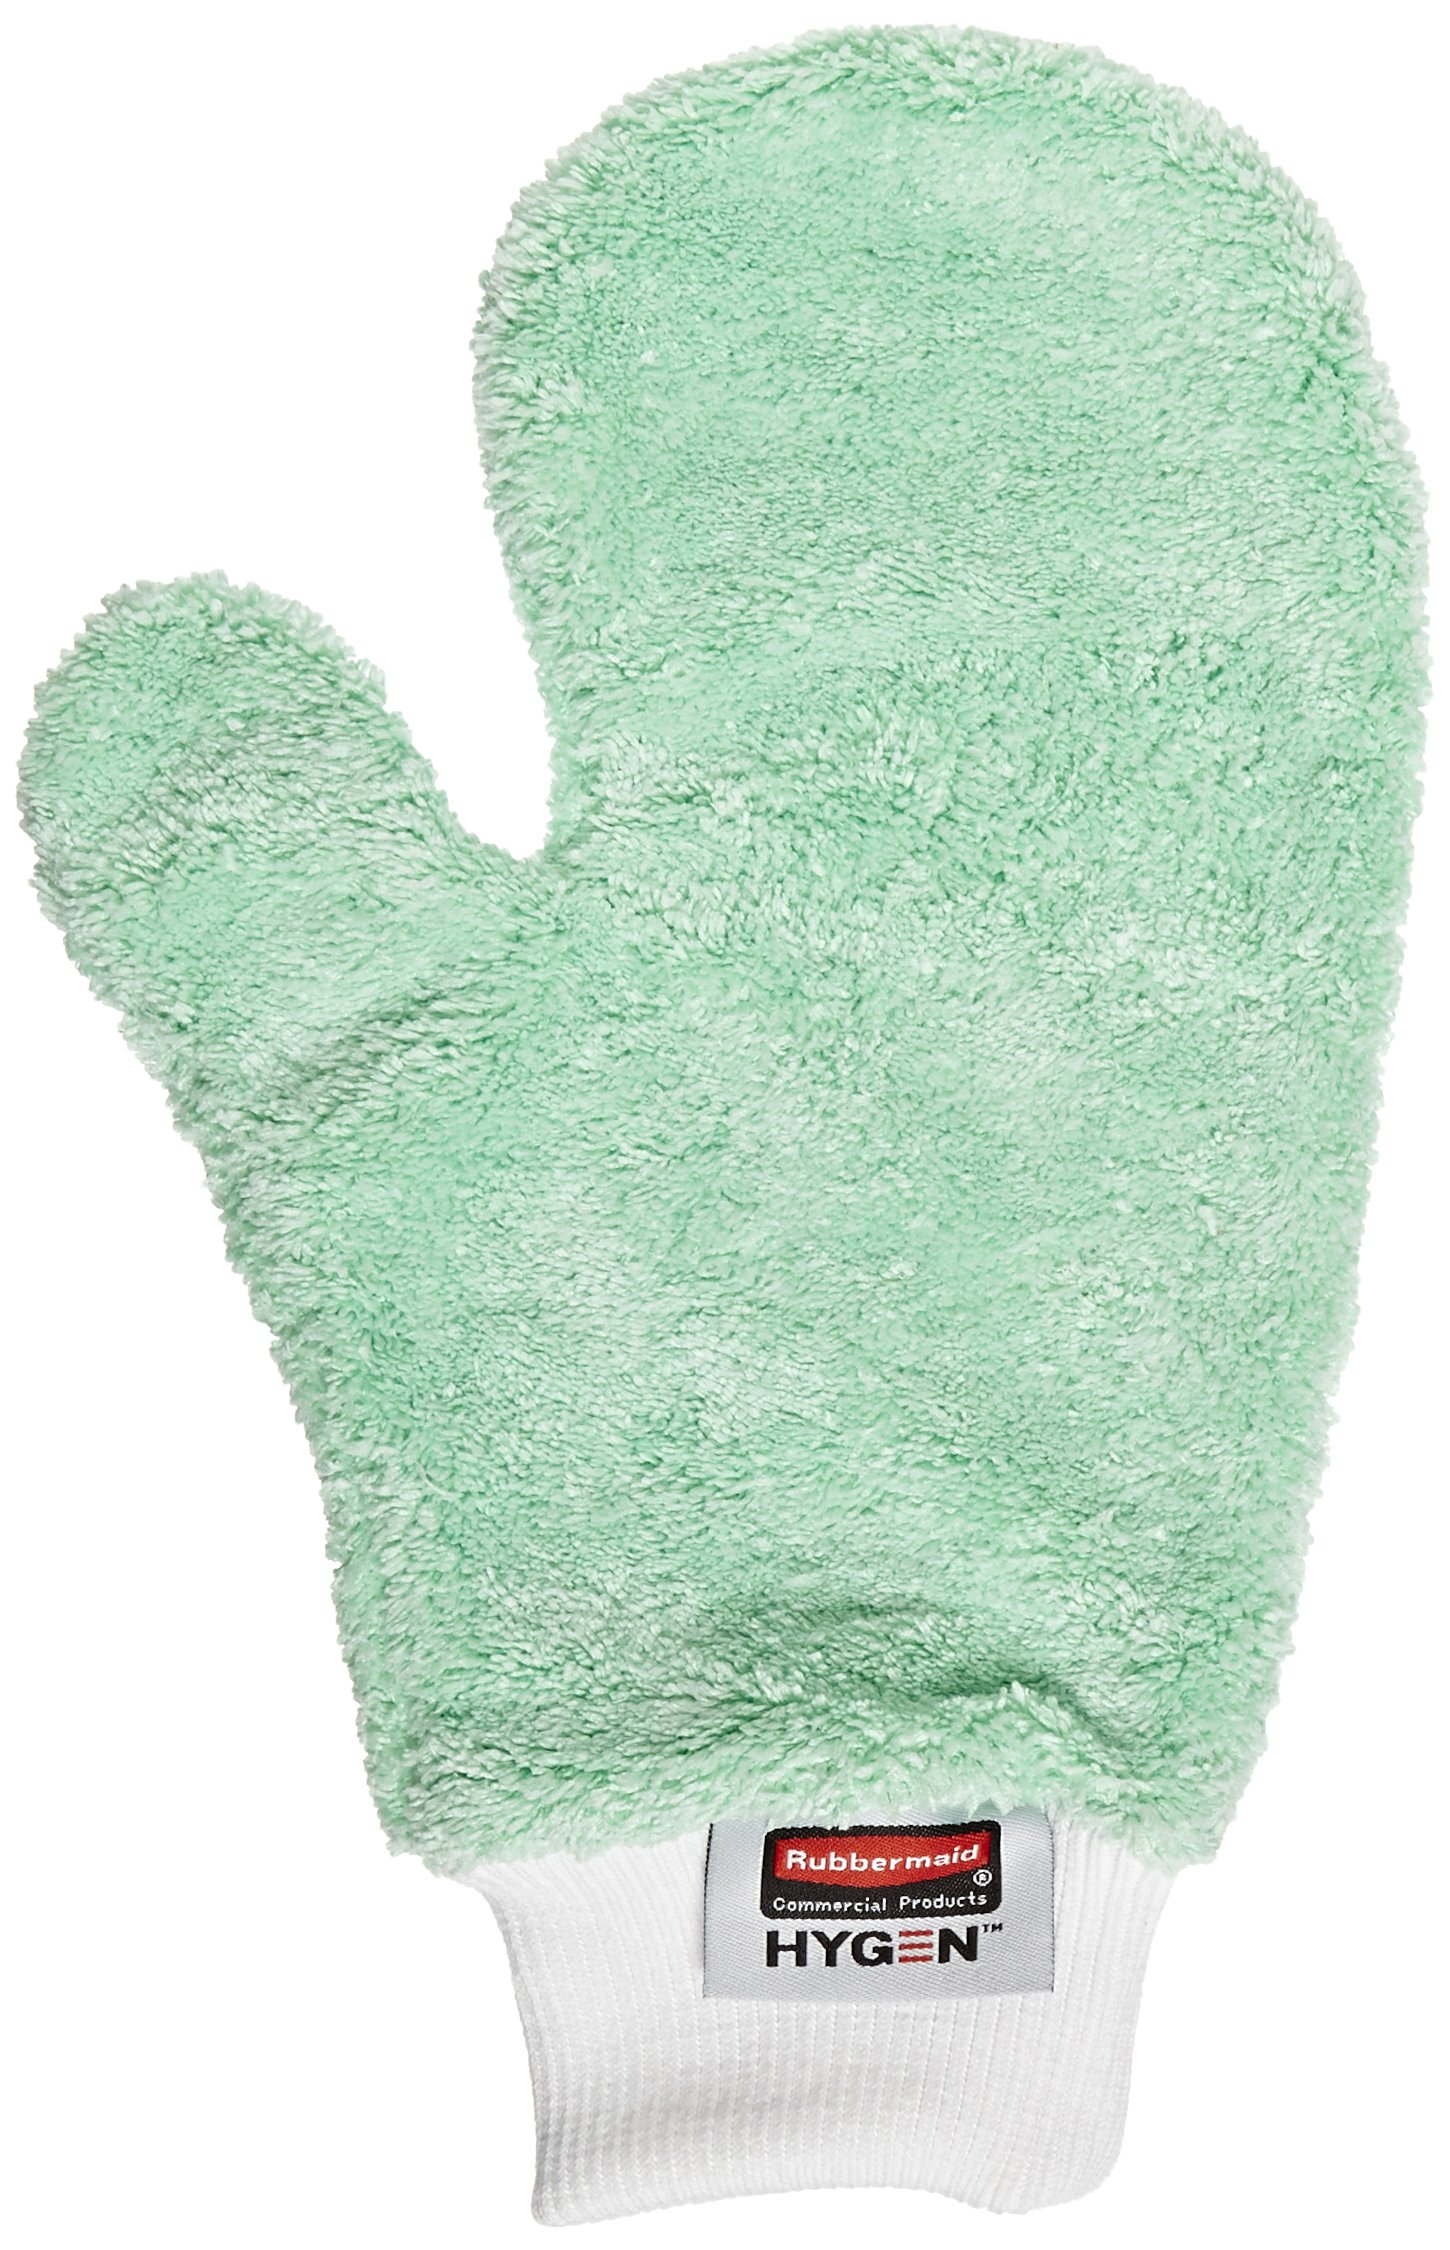 Rubbermaid Commercial Hygen Microfiber Dusting Mitt, 11-7/8-Inch Length X 9-7/8-Inch Width X 2-Inch Height, Green (FGQ65200GR00)